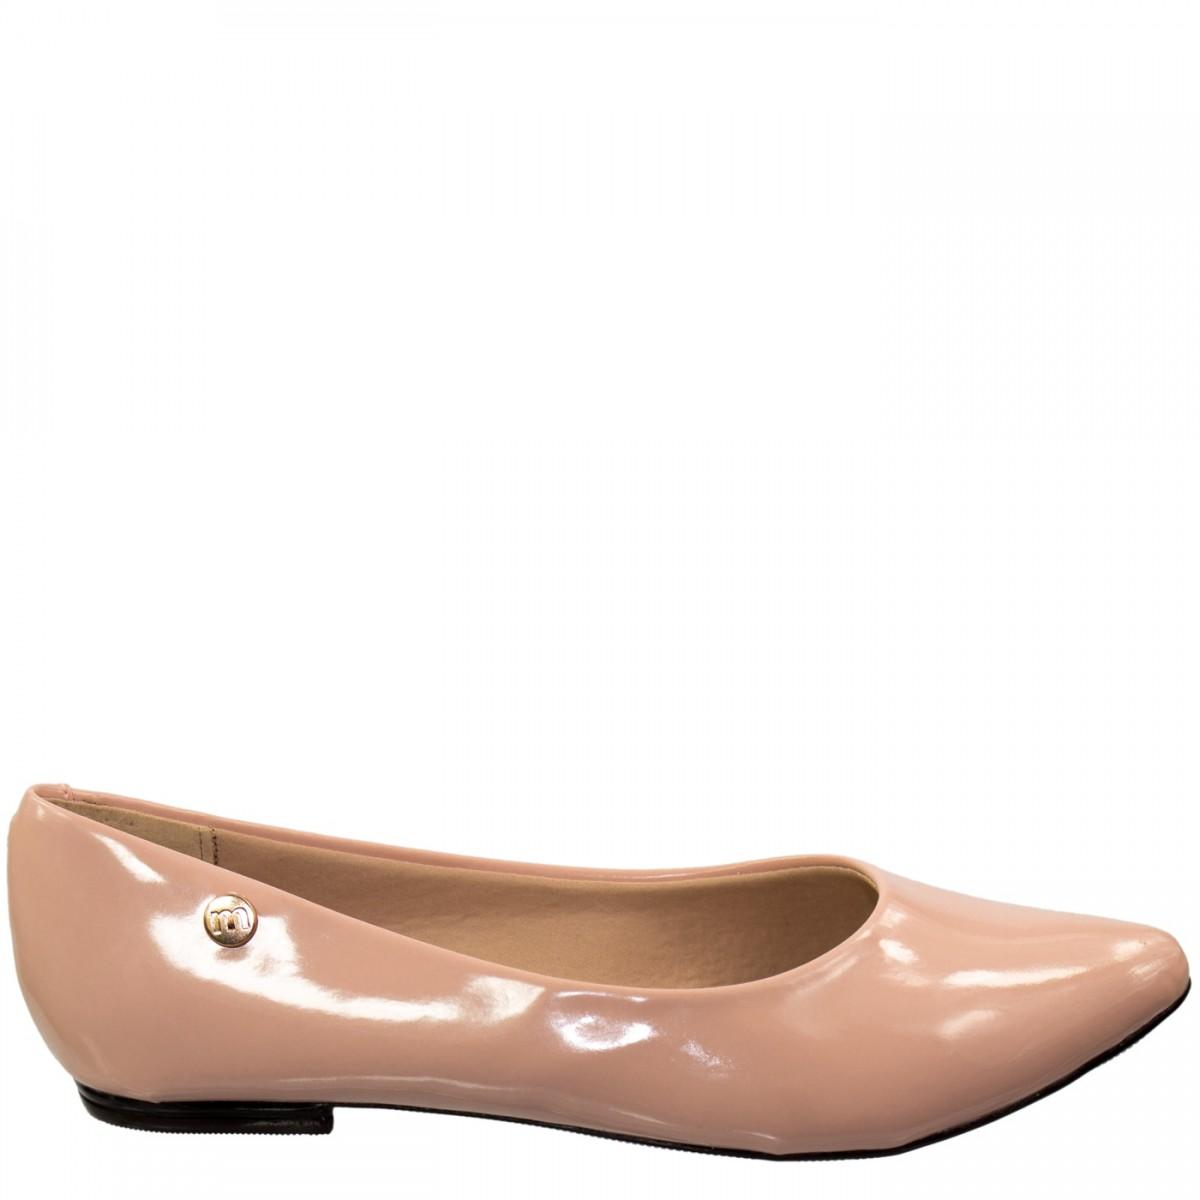 5add6d47f Bizz Store - Sapatilha Feminina Moleca Verniz Nude Bico Fino